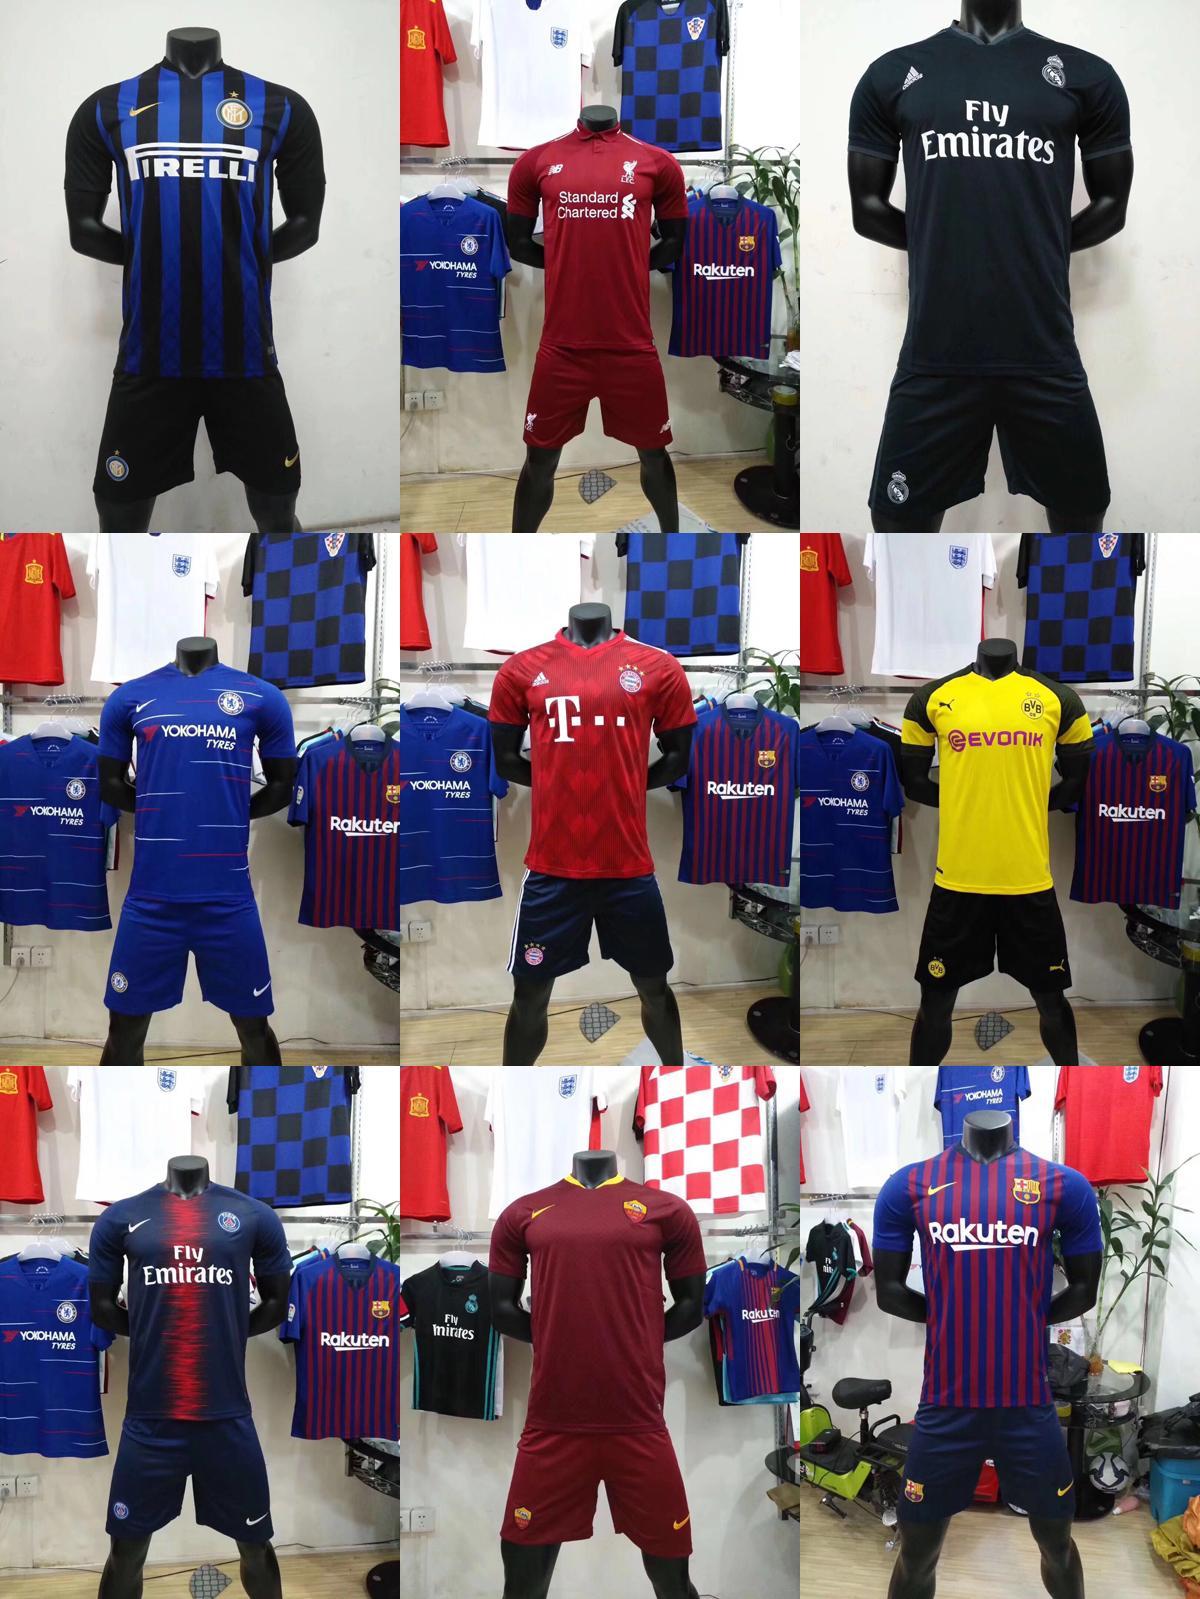 2018 World Cup soccer uniforms wholesale 1